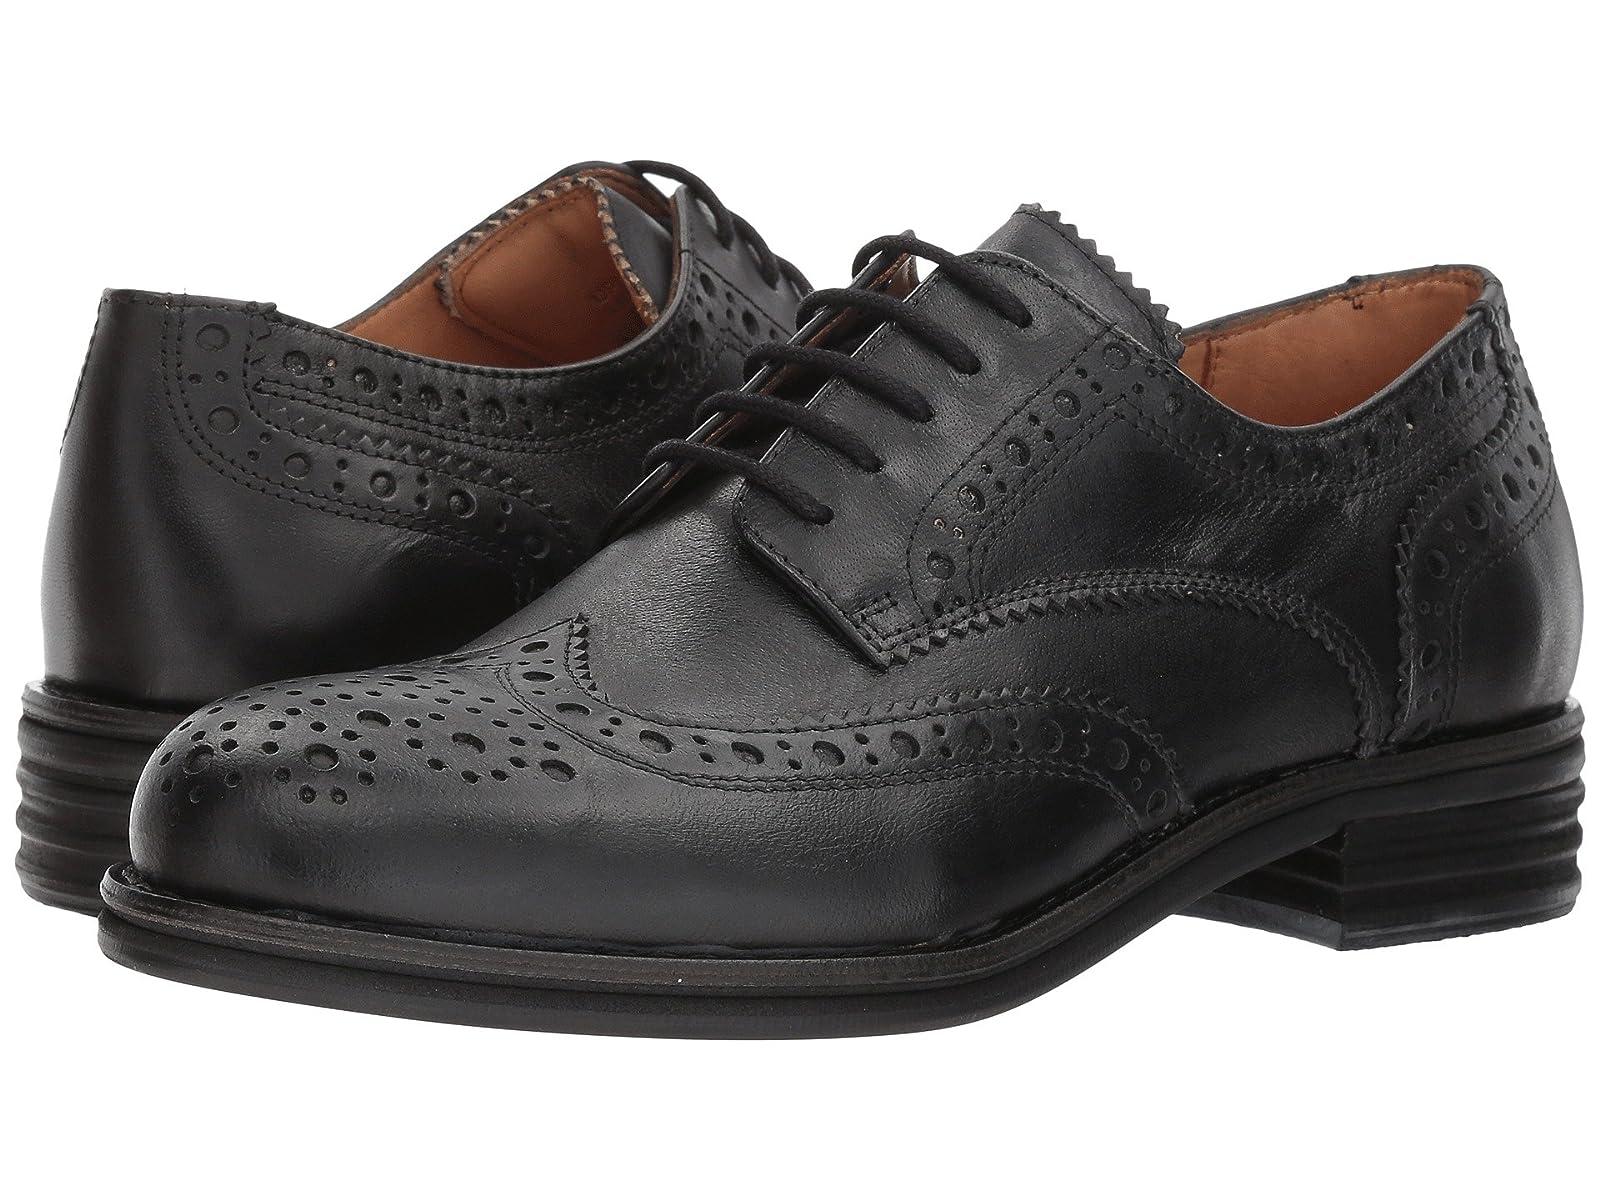 Vince Camuto CortenAtmospheric grades have affordable shoes